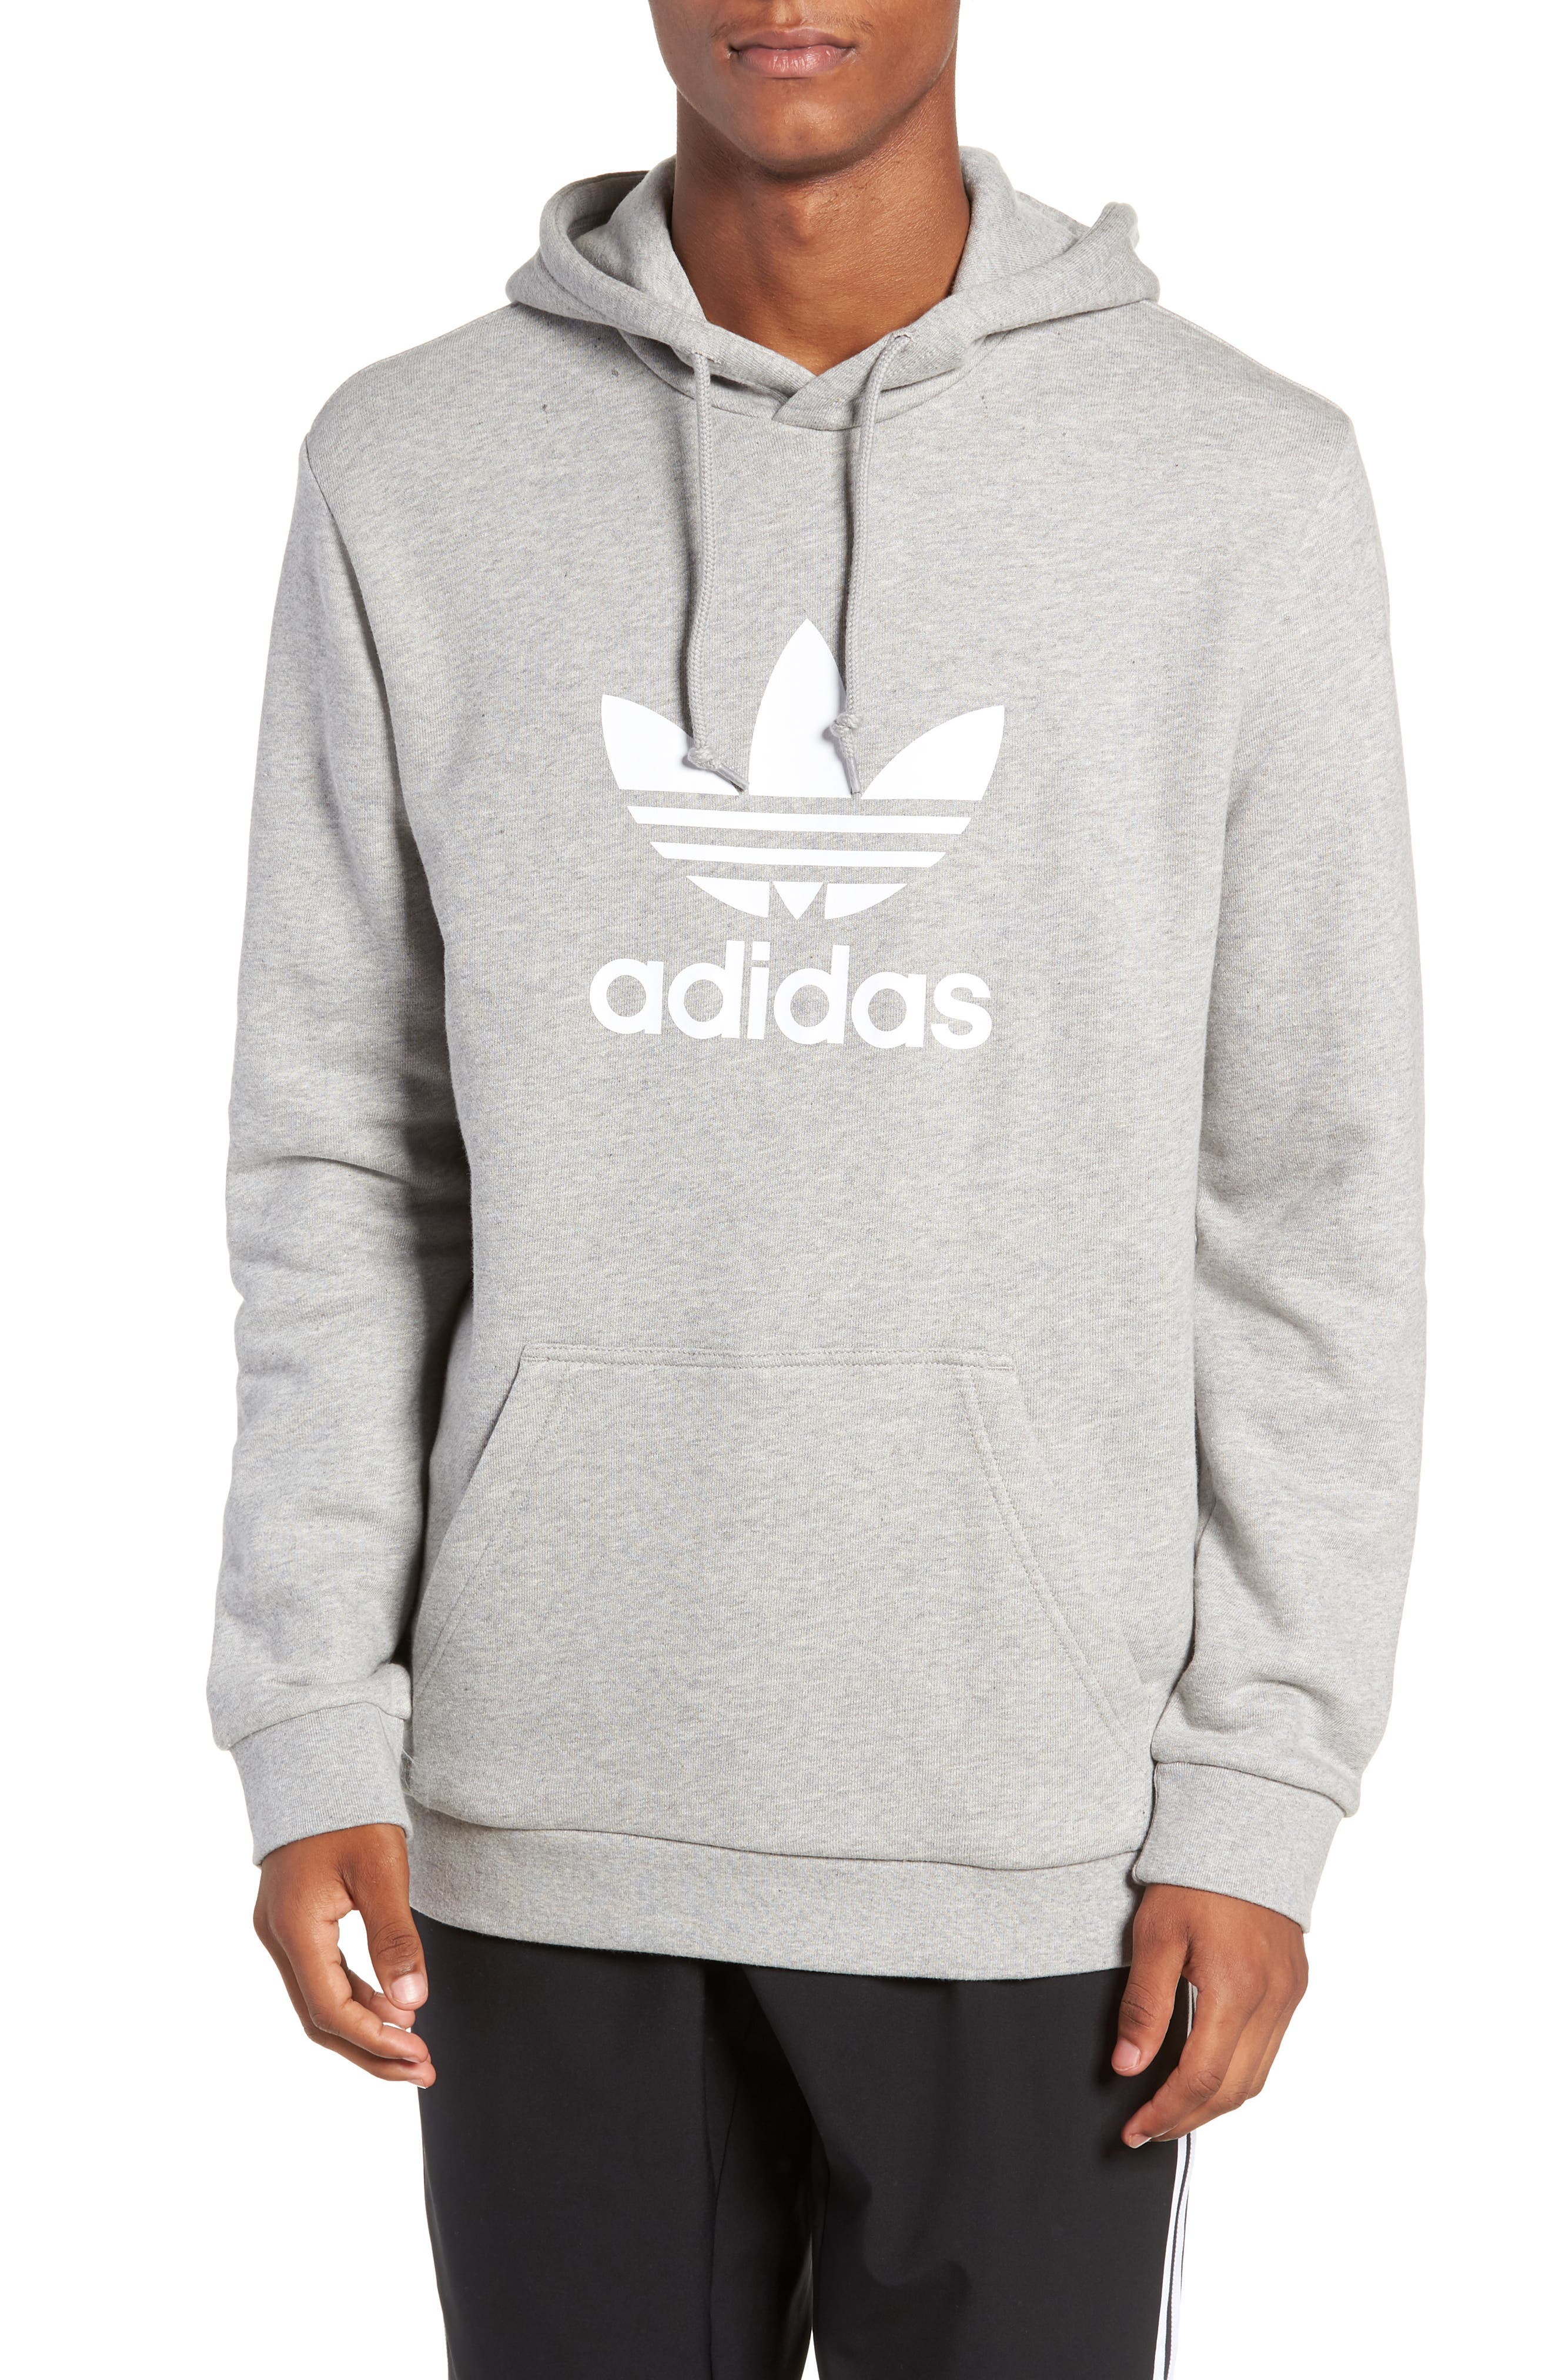 adidas Originals Trefoil Hoodie DX3614